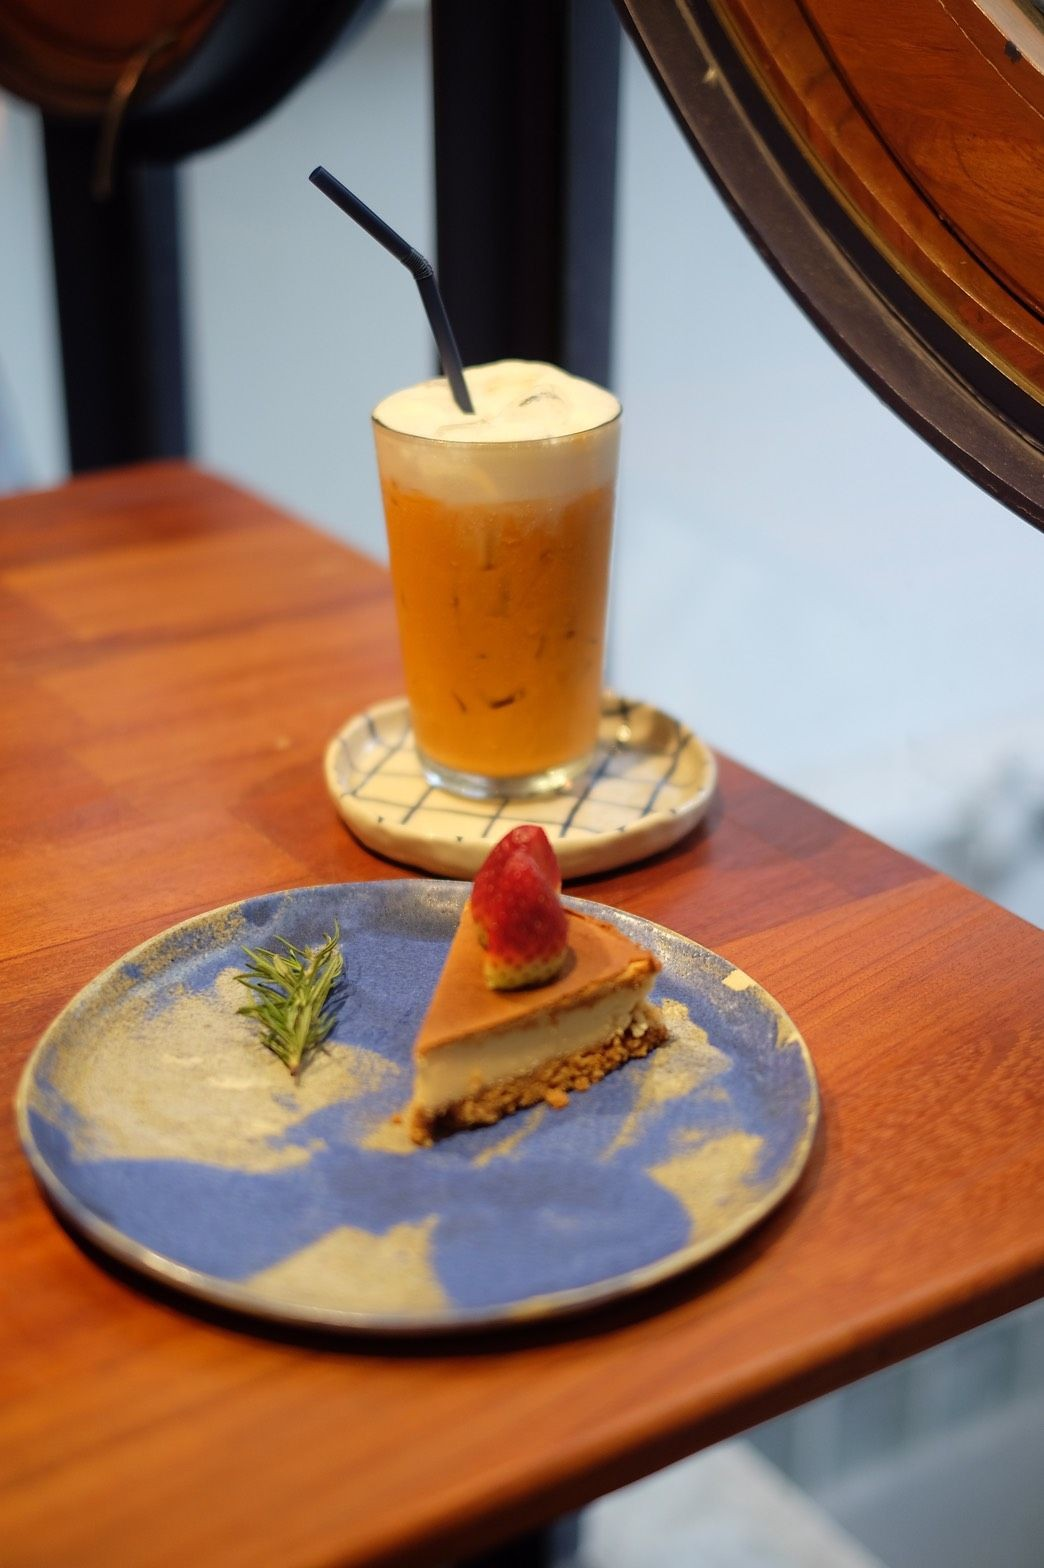 A clay cafe